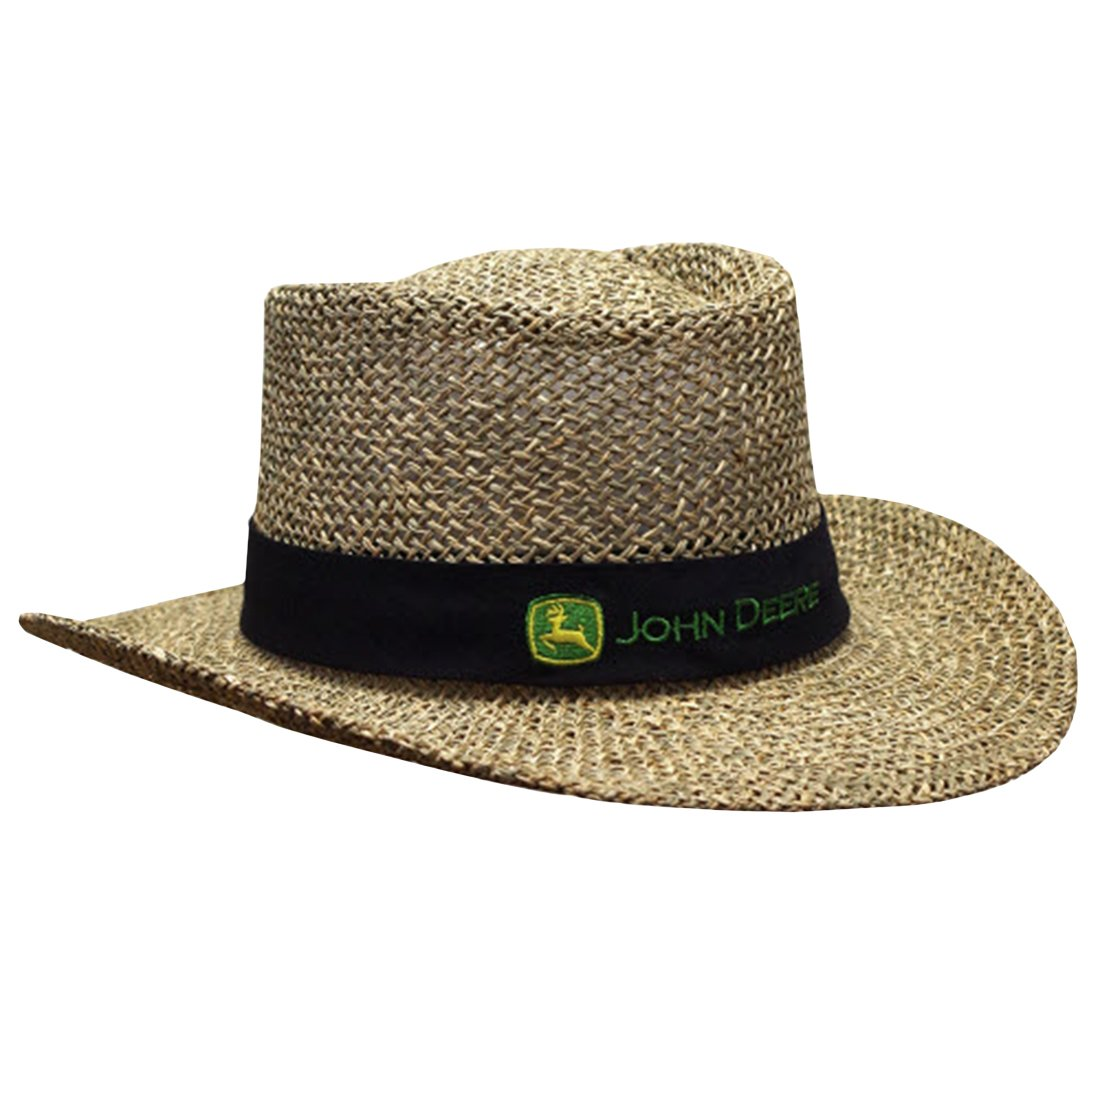 51972f80c John Deere Brand Black Straw Hat With Neck Strap